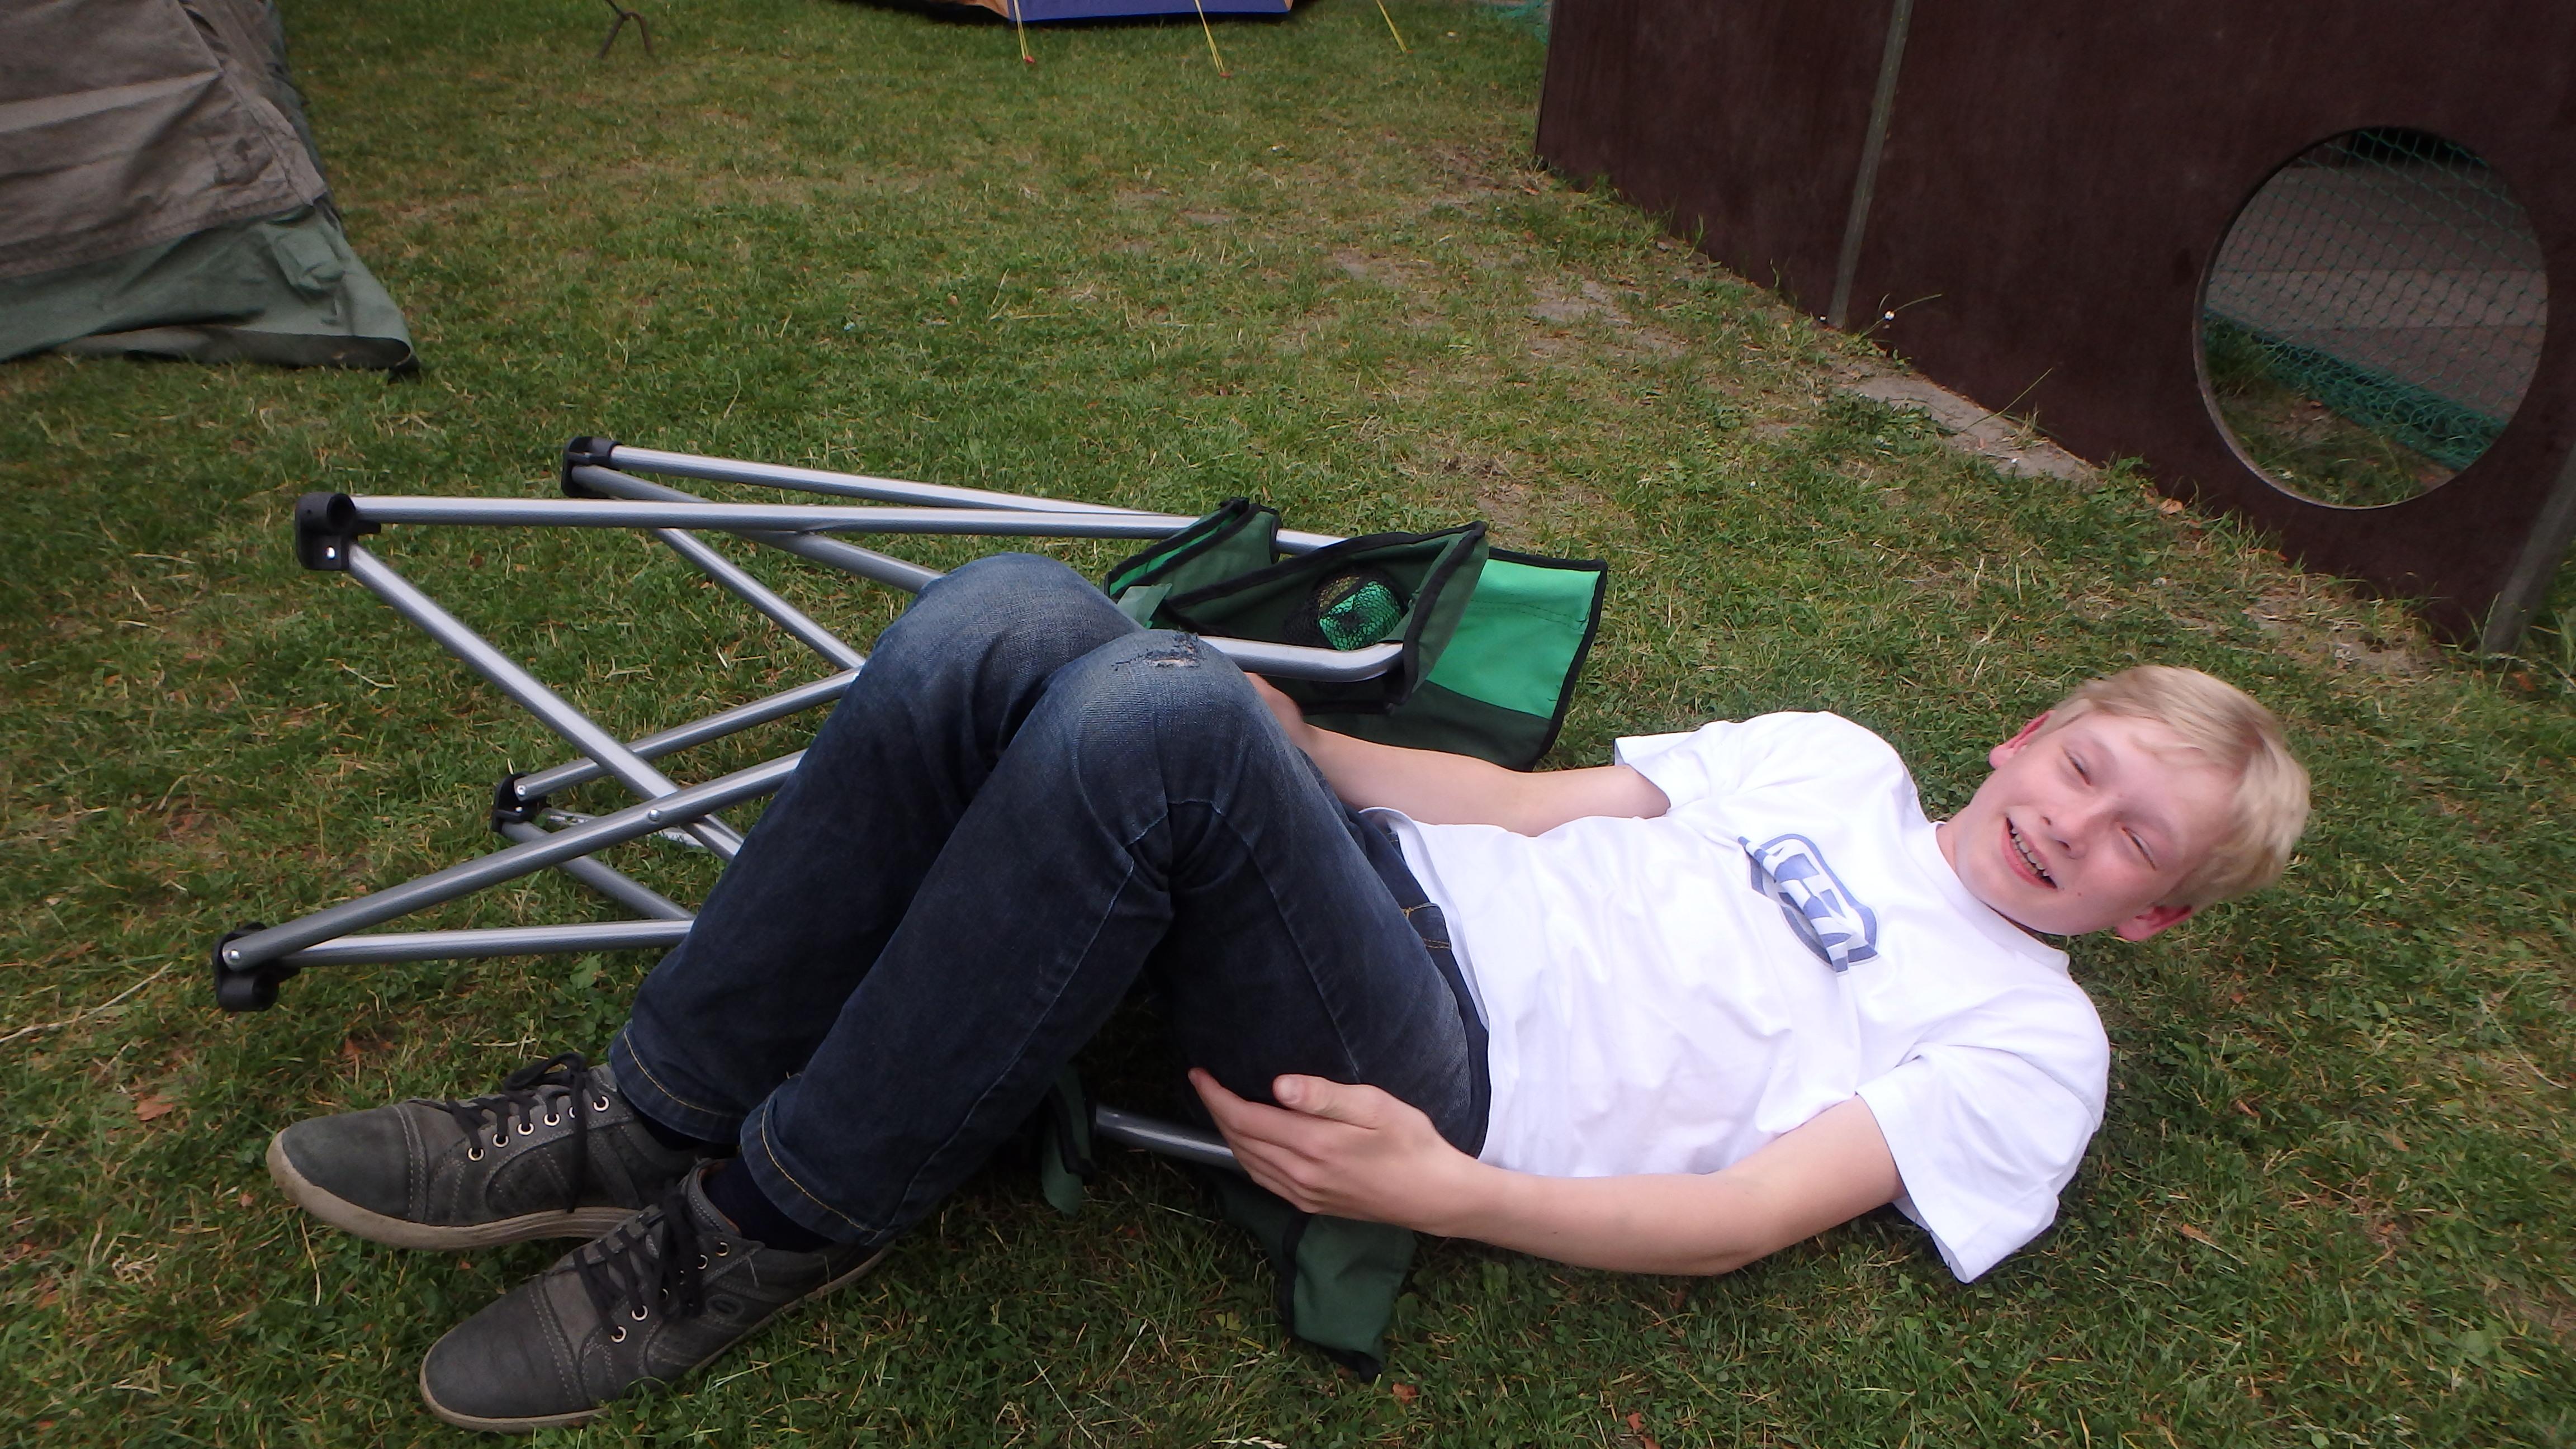 Fällt Jonathan vor Hunger vom Stuhl?